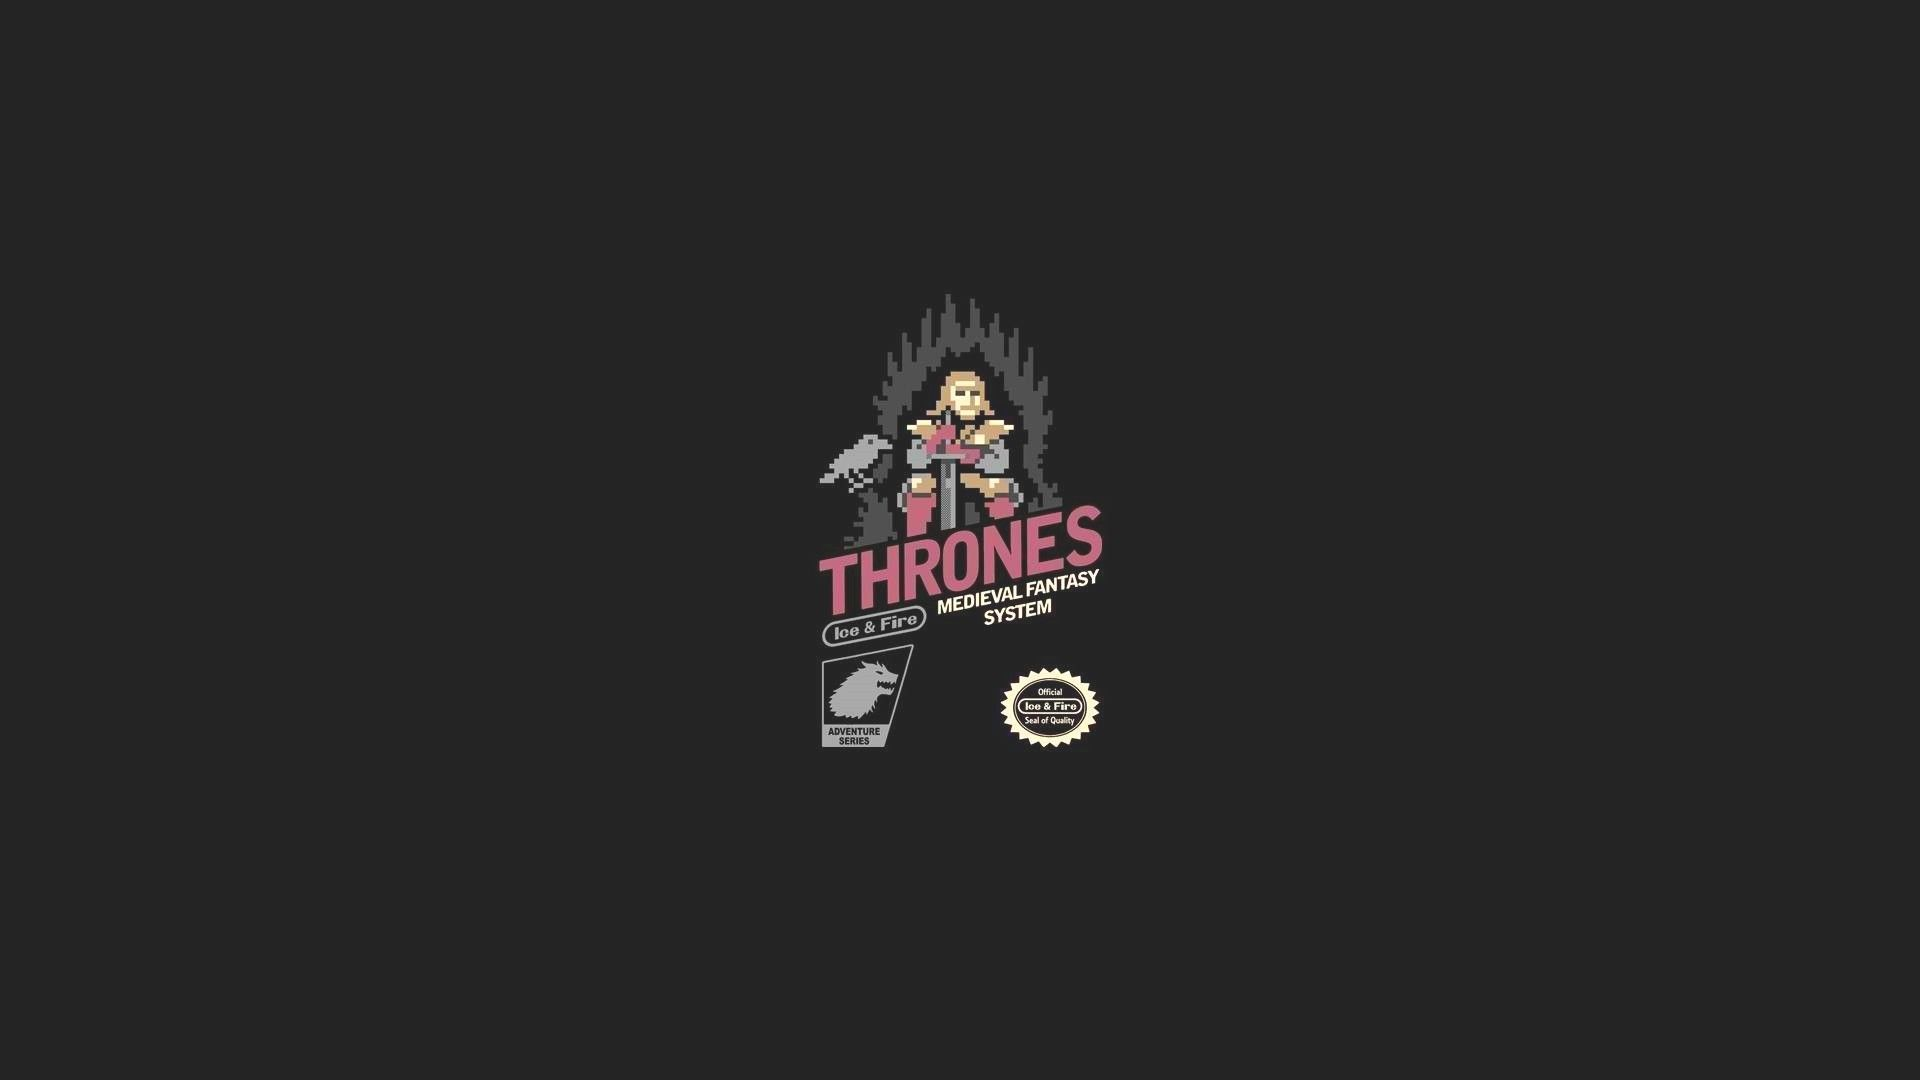 Game of Thrones art minimalist